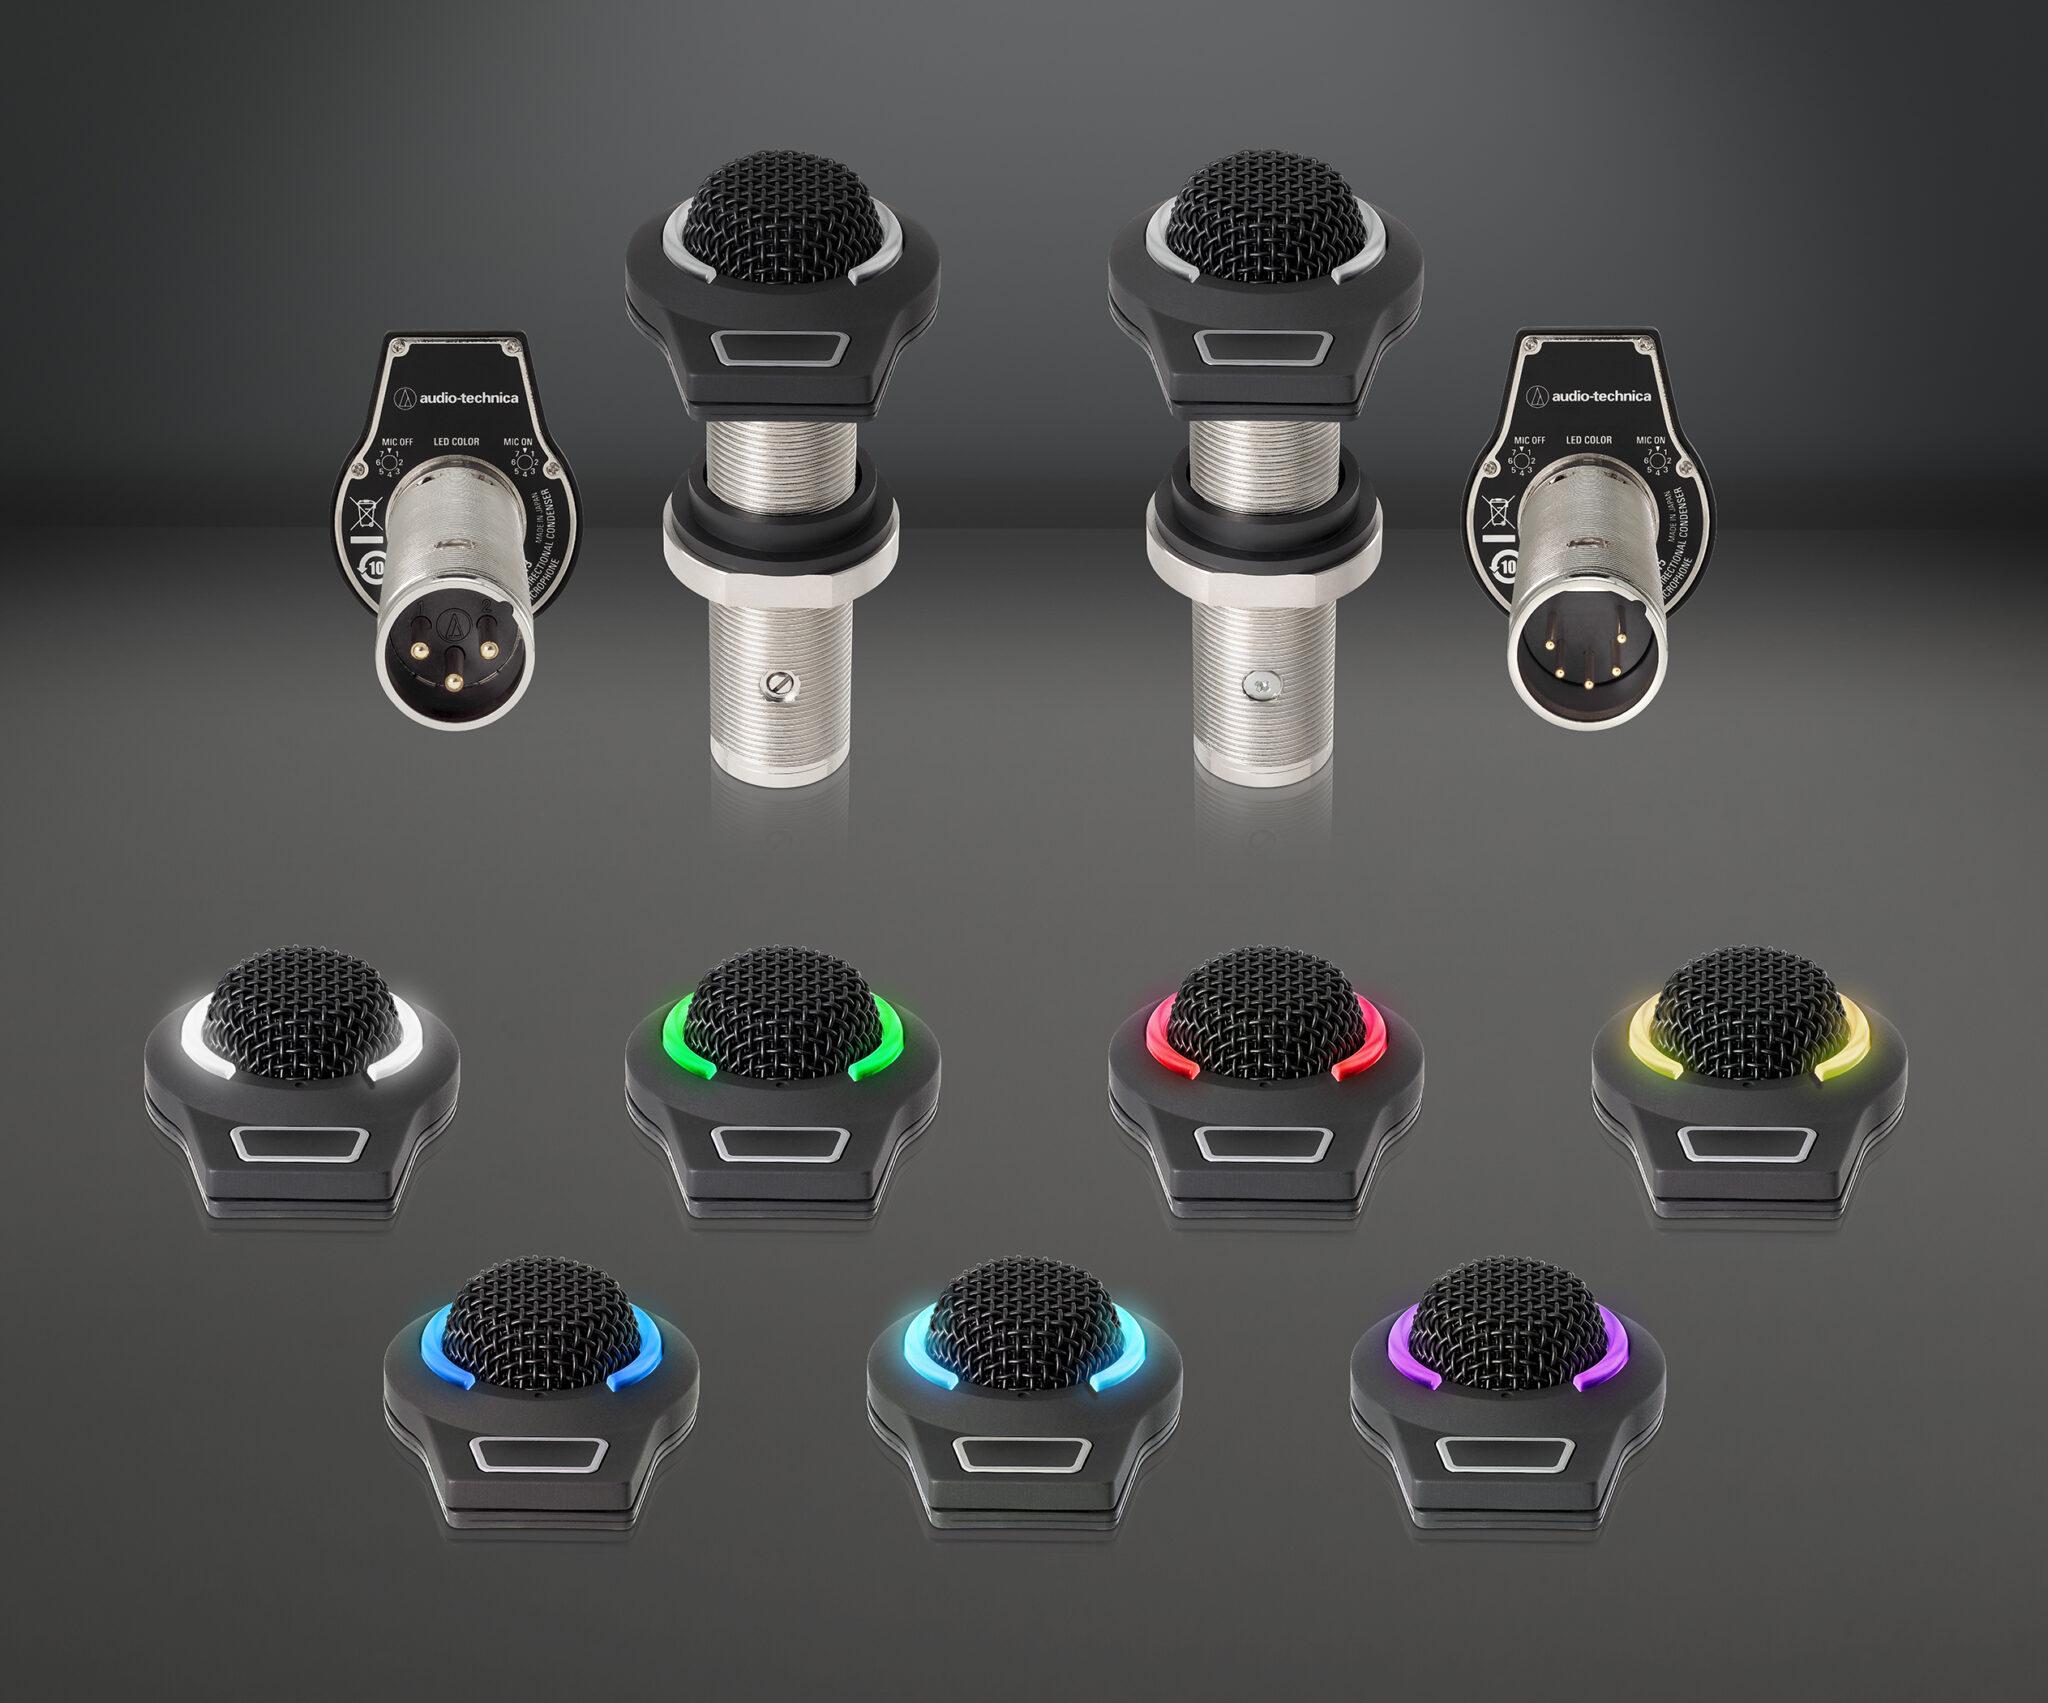 Audio-Technica Offers Its ES945O/FM3, ES947C/FM3, ES945O/FM5 and ES947C/FM5 Condenser Boundary Mics with Touch-Sensitive Control for Conferencing Applications